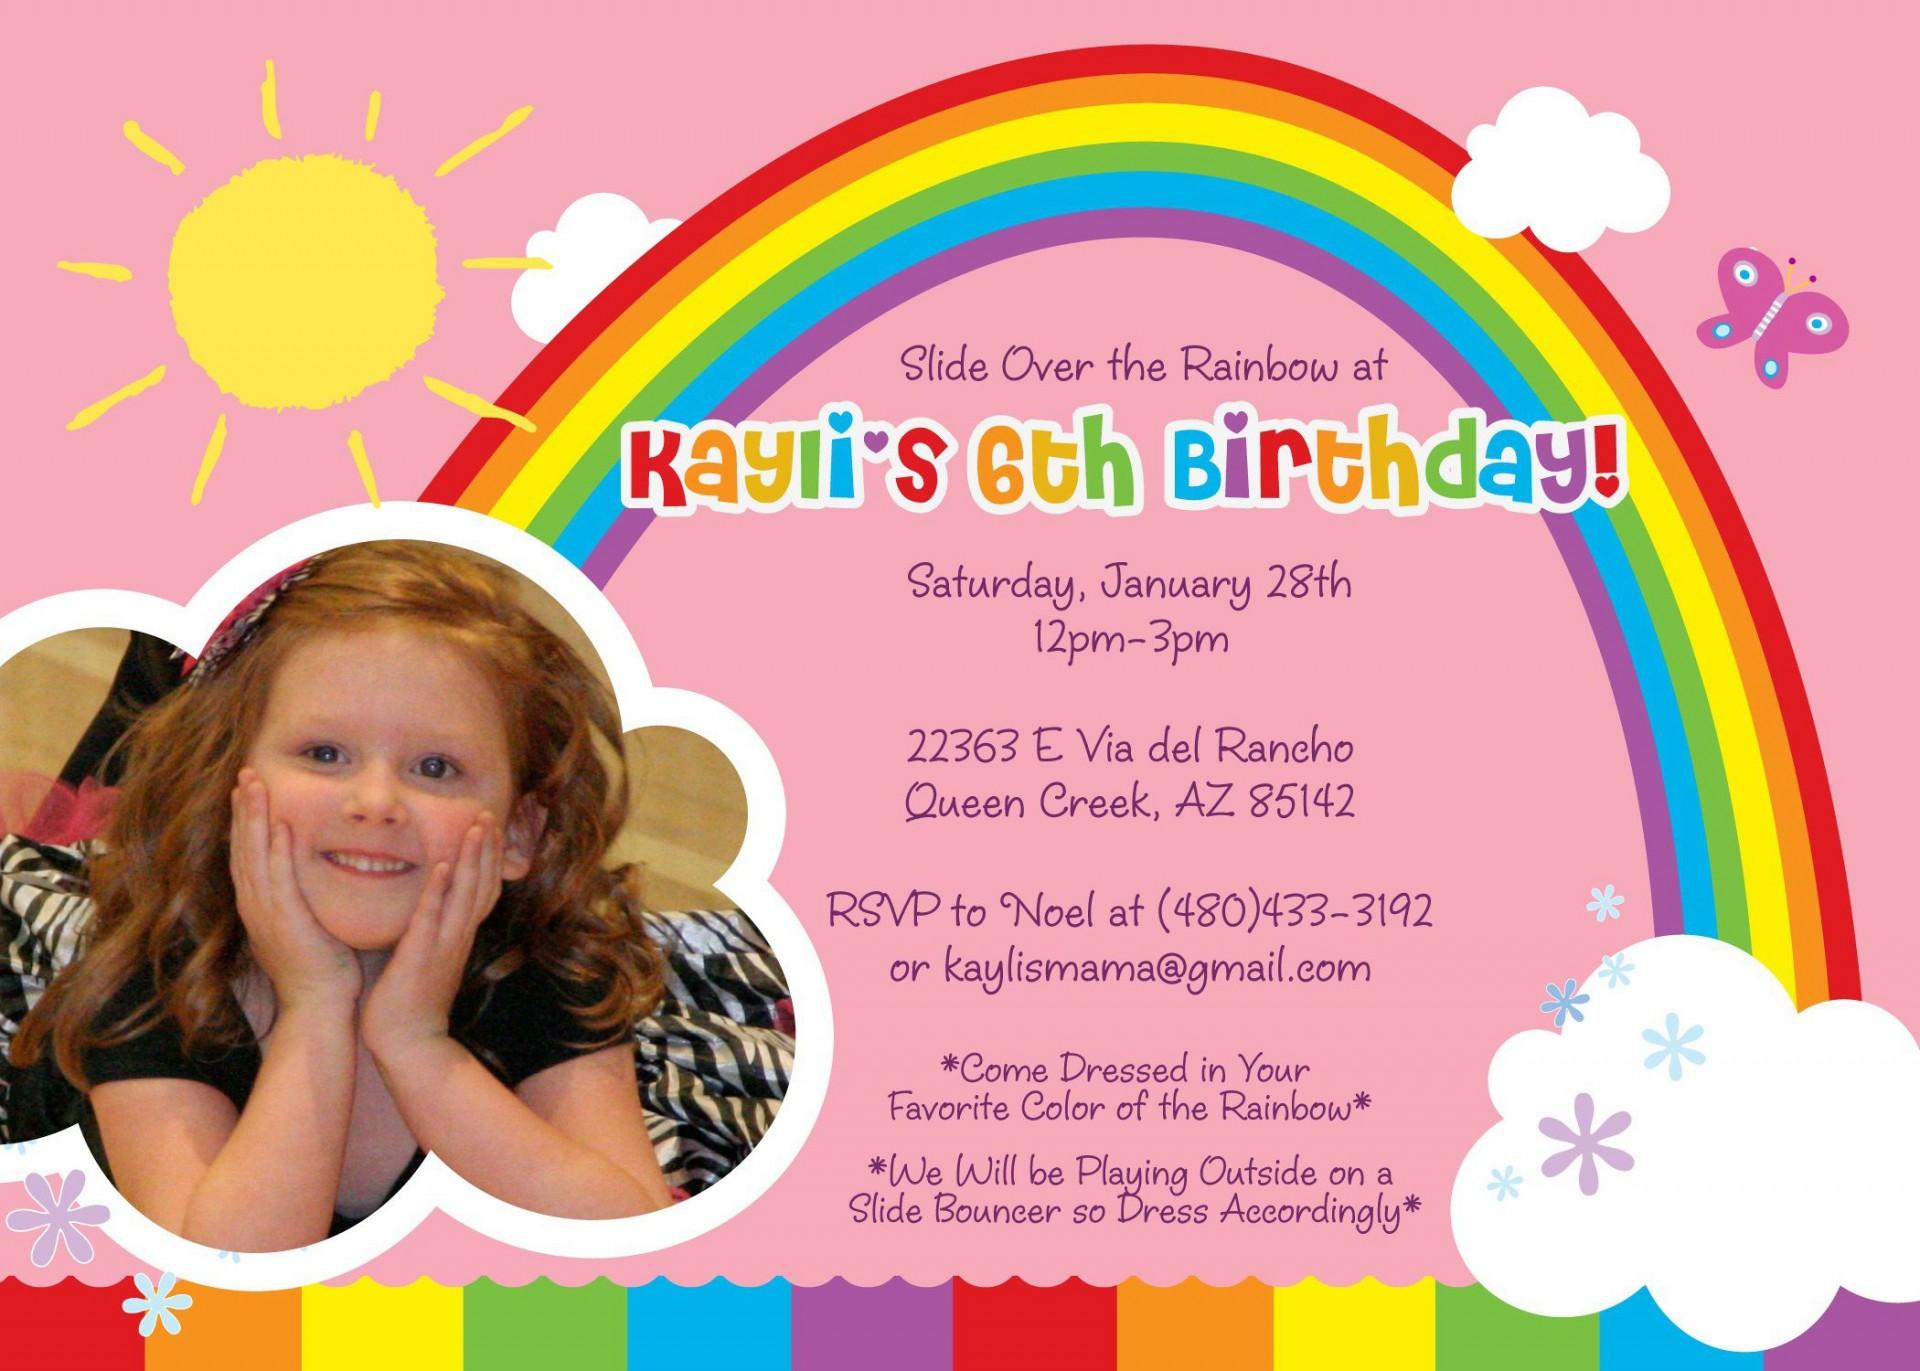 009 Striking Birthday Party Invitation Template Word Photo  40th Wording Sample Unicorn Free1920